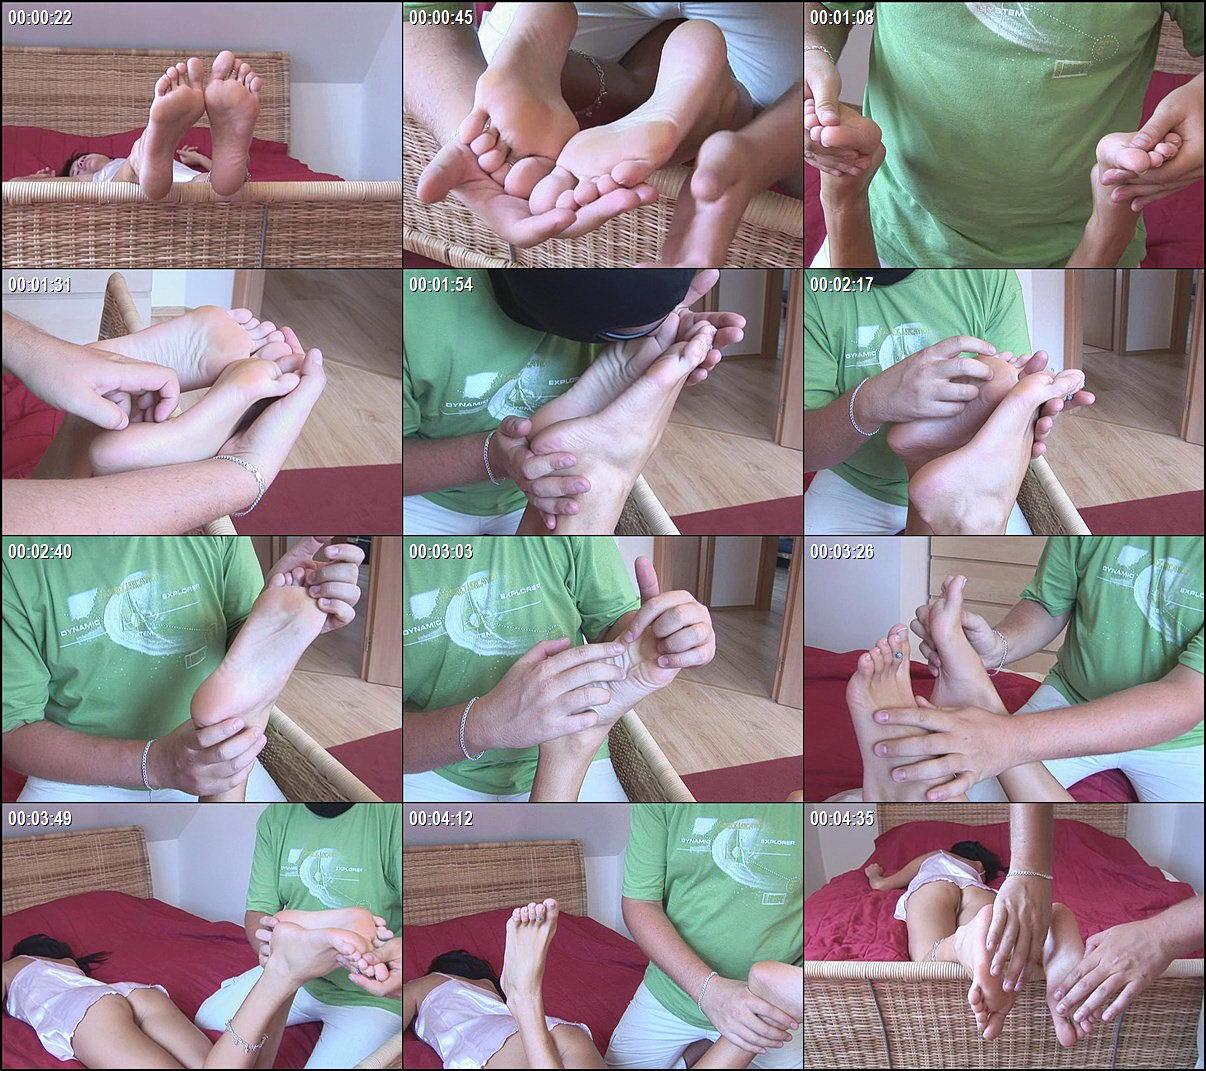 Tickle Sex Stories